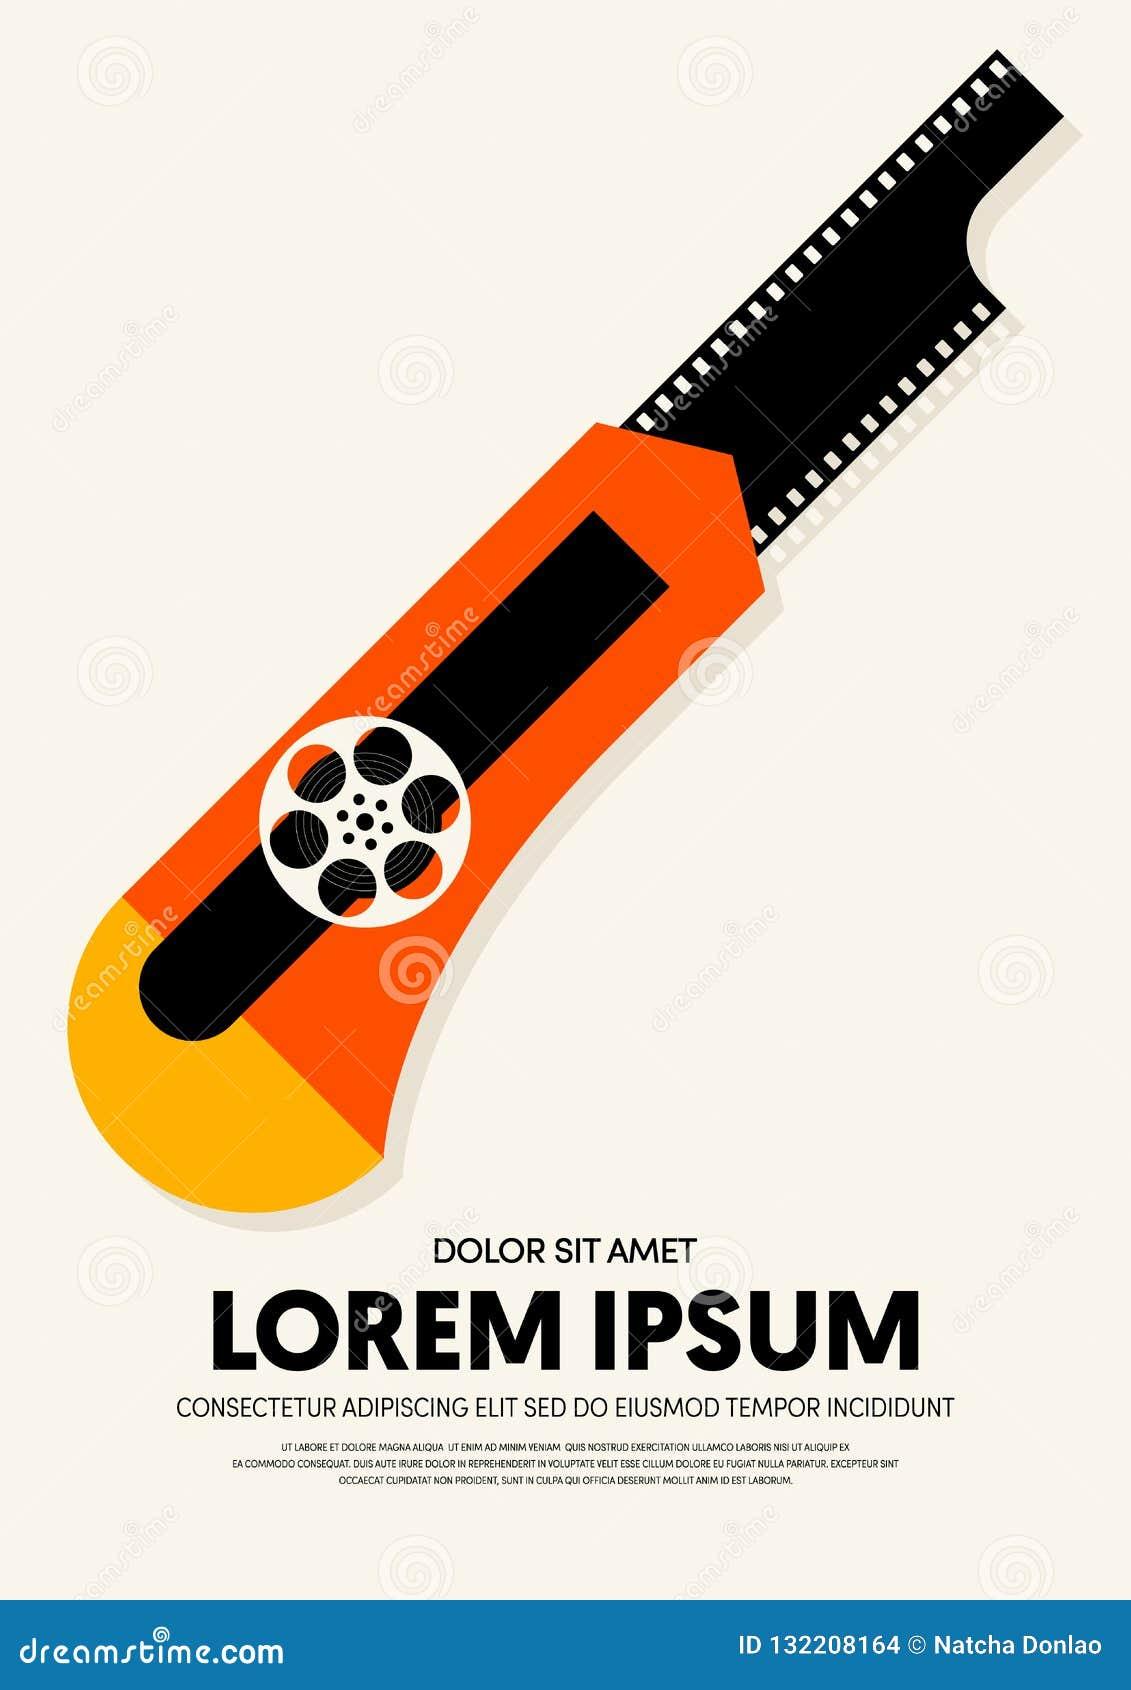 Movie And Film Poster Design Template Background Modern Vintage Retro Style Stock Illustration Illustration Of Design Frame 132208164